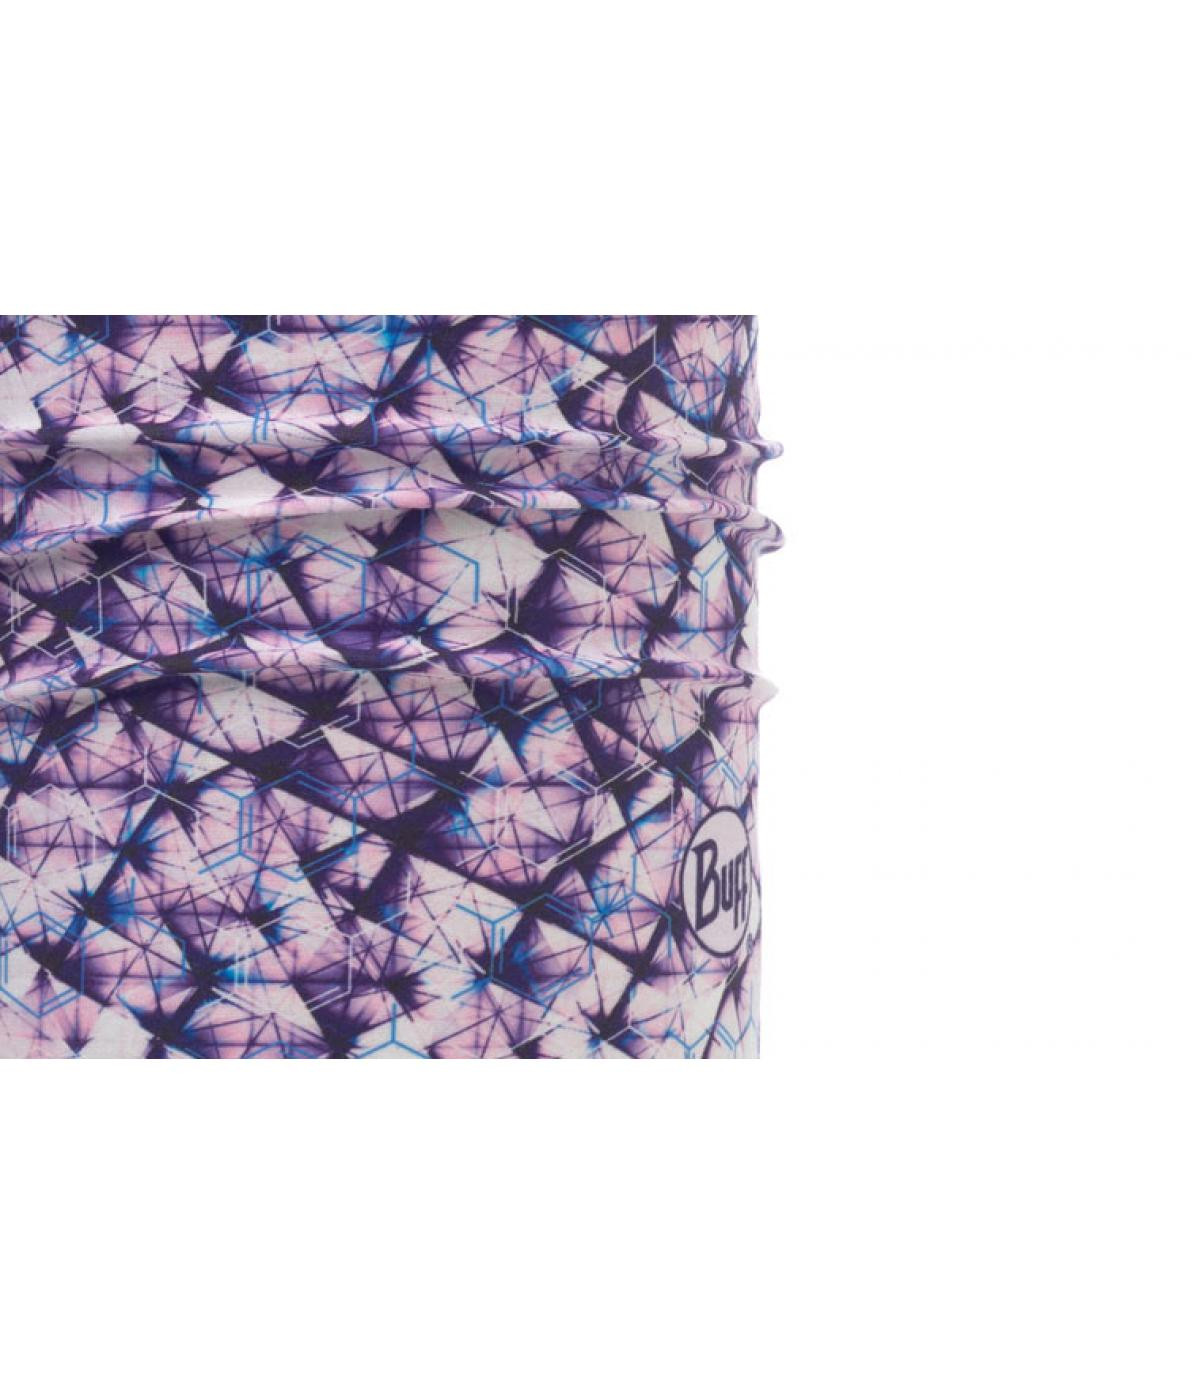 Details Perform Adren purple lilac - afbeeling 2